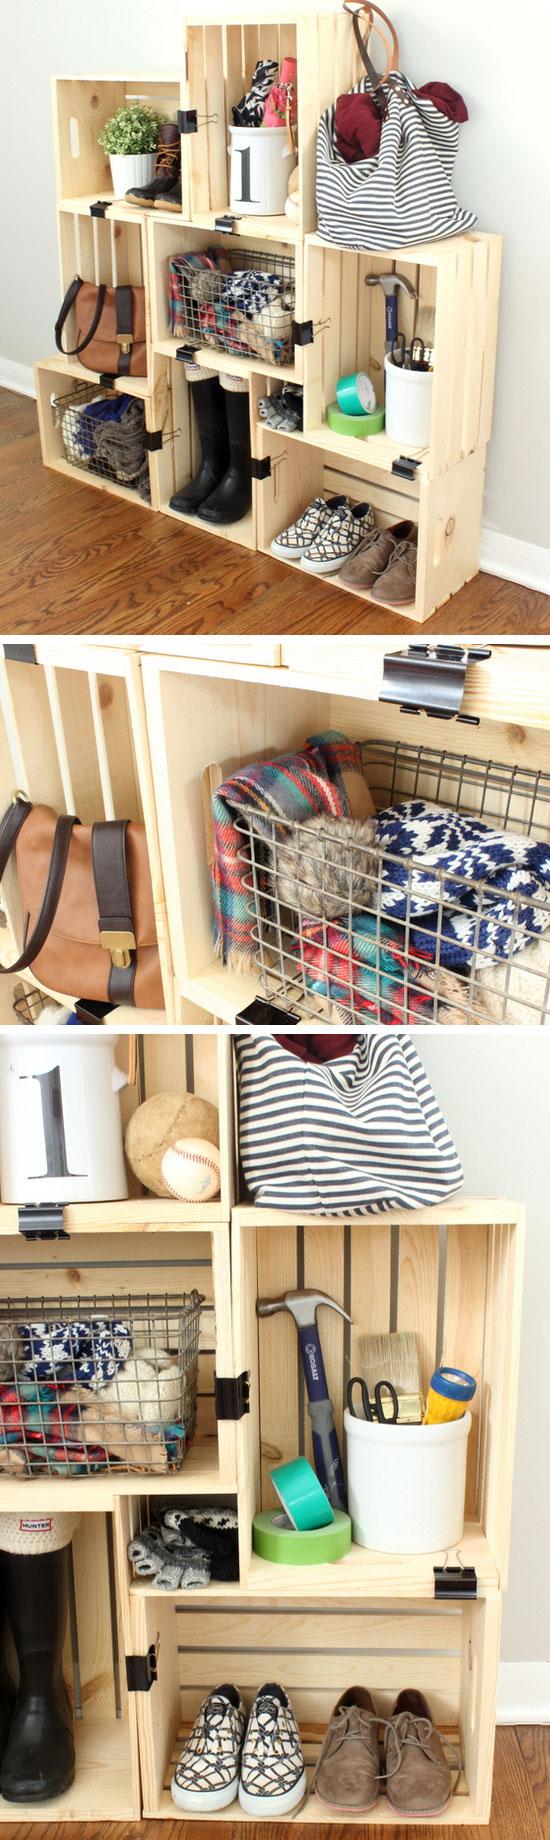 Decorating Small Apartment Closet - Image of Bathroom and Closet